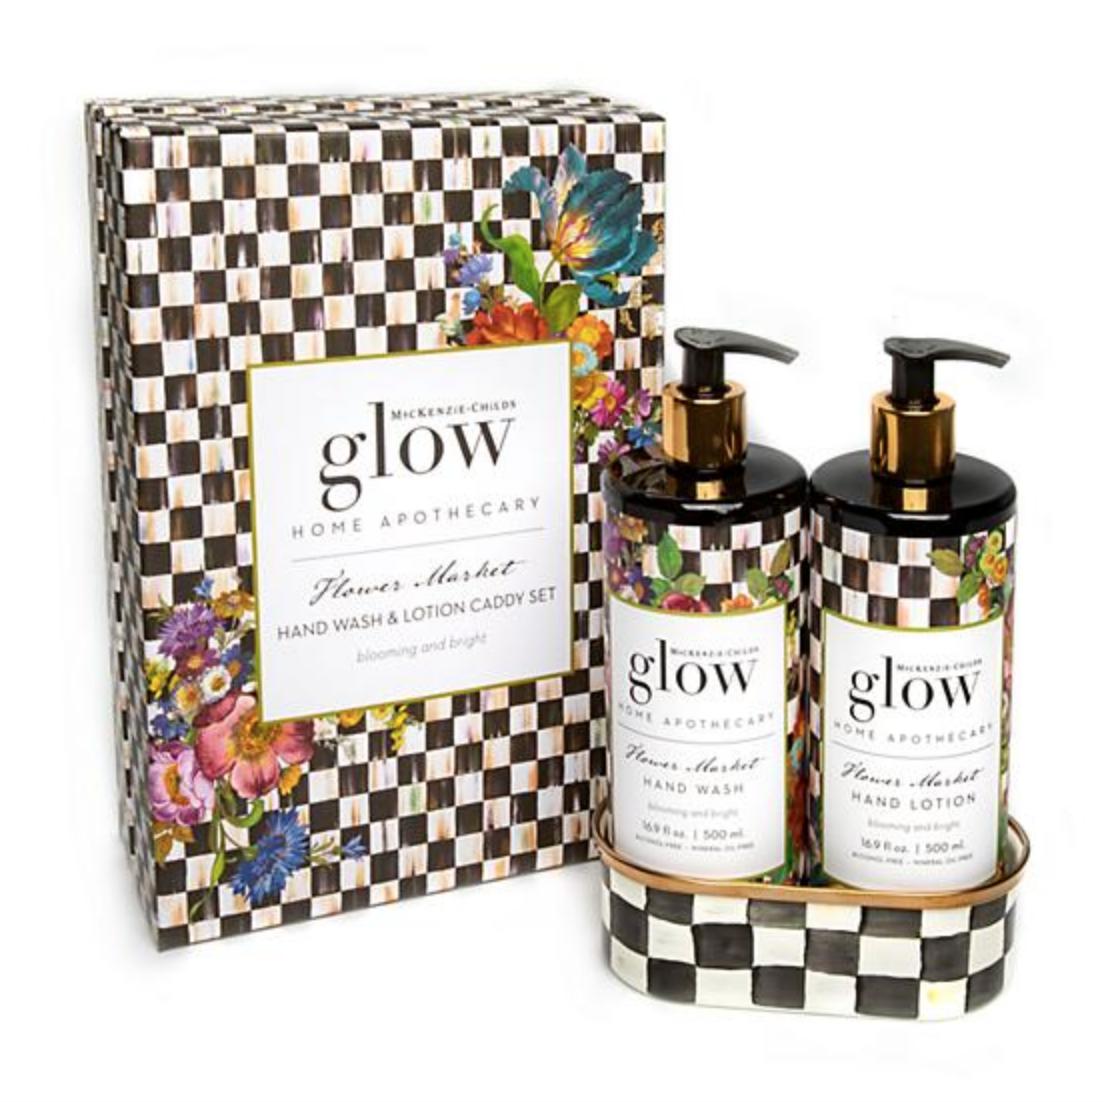 Flower Market Soap & Lotion Caddy Set